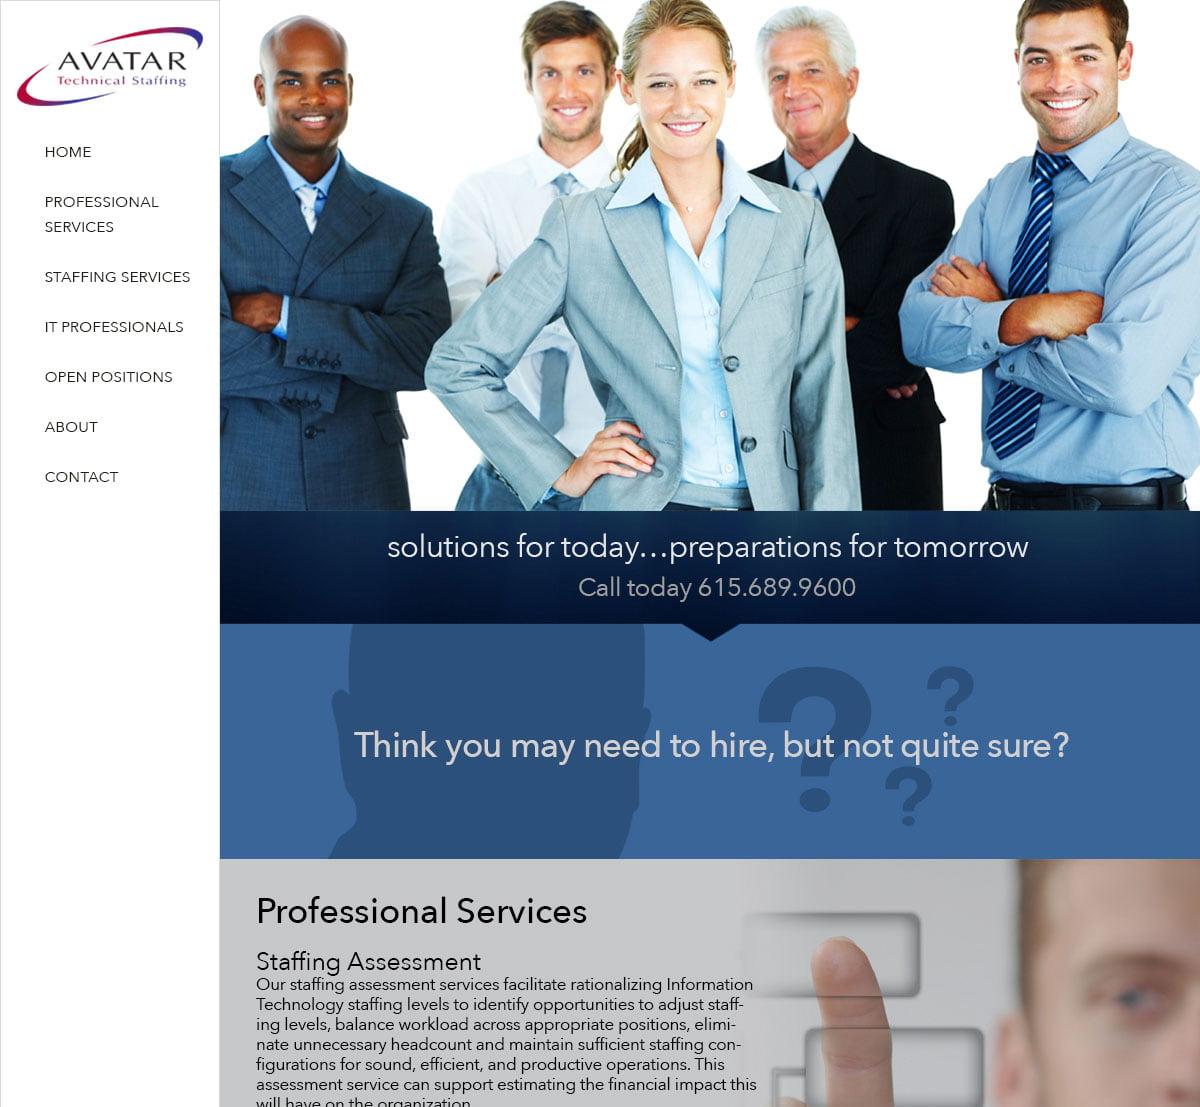 Avatar Technical Staffing Website design by Rimshot Creative, Columbia TN, Spring Hill TN